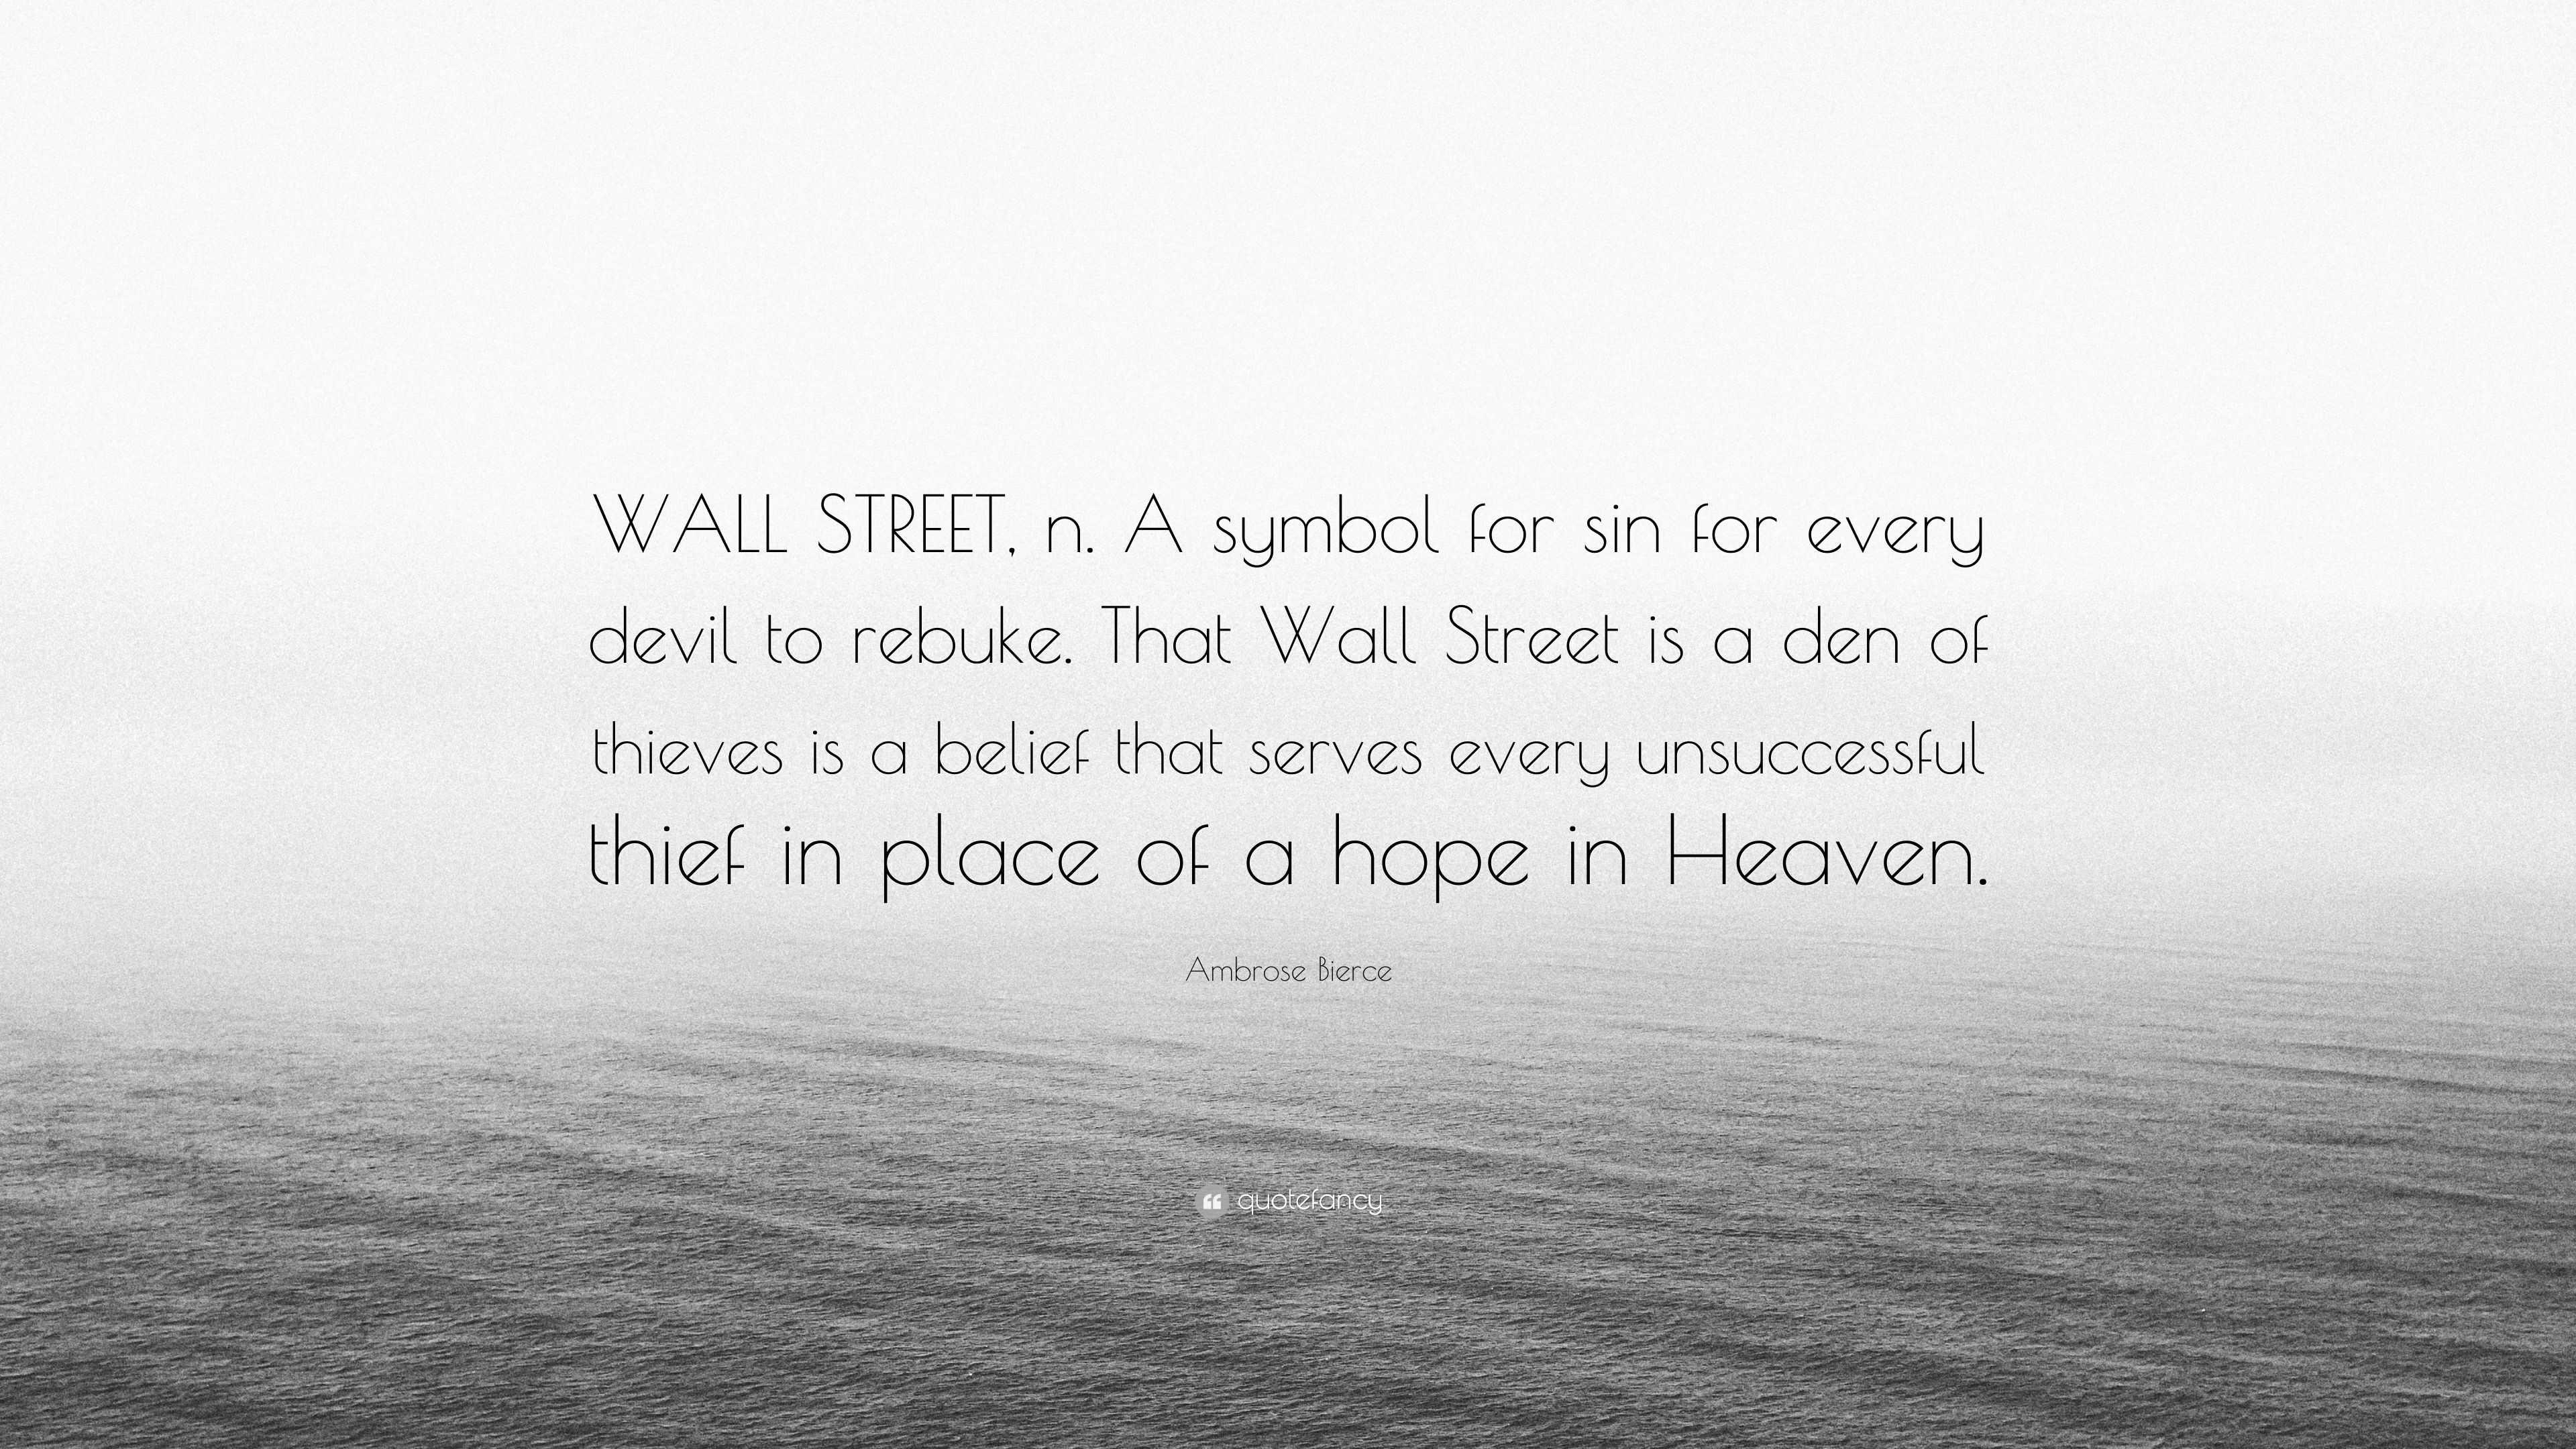 Ambrose bierce quote wall street n a symbol for sin for every ambrose bierce quote wall street n a symbol for sin for every biocorpaavc Choice Image